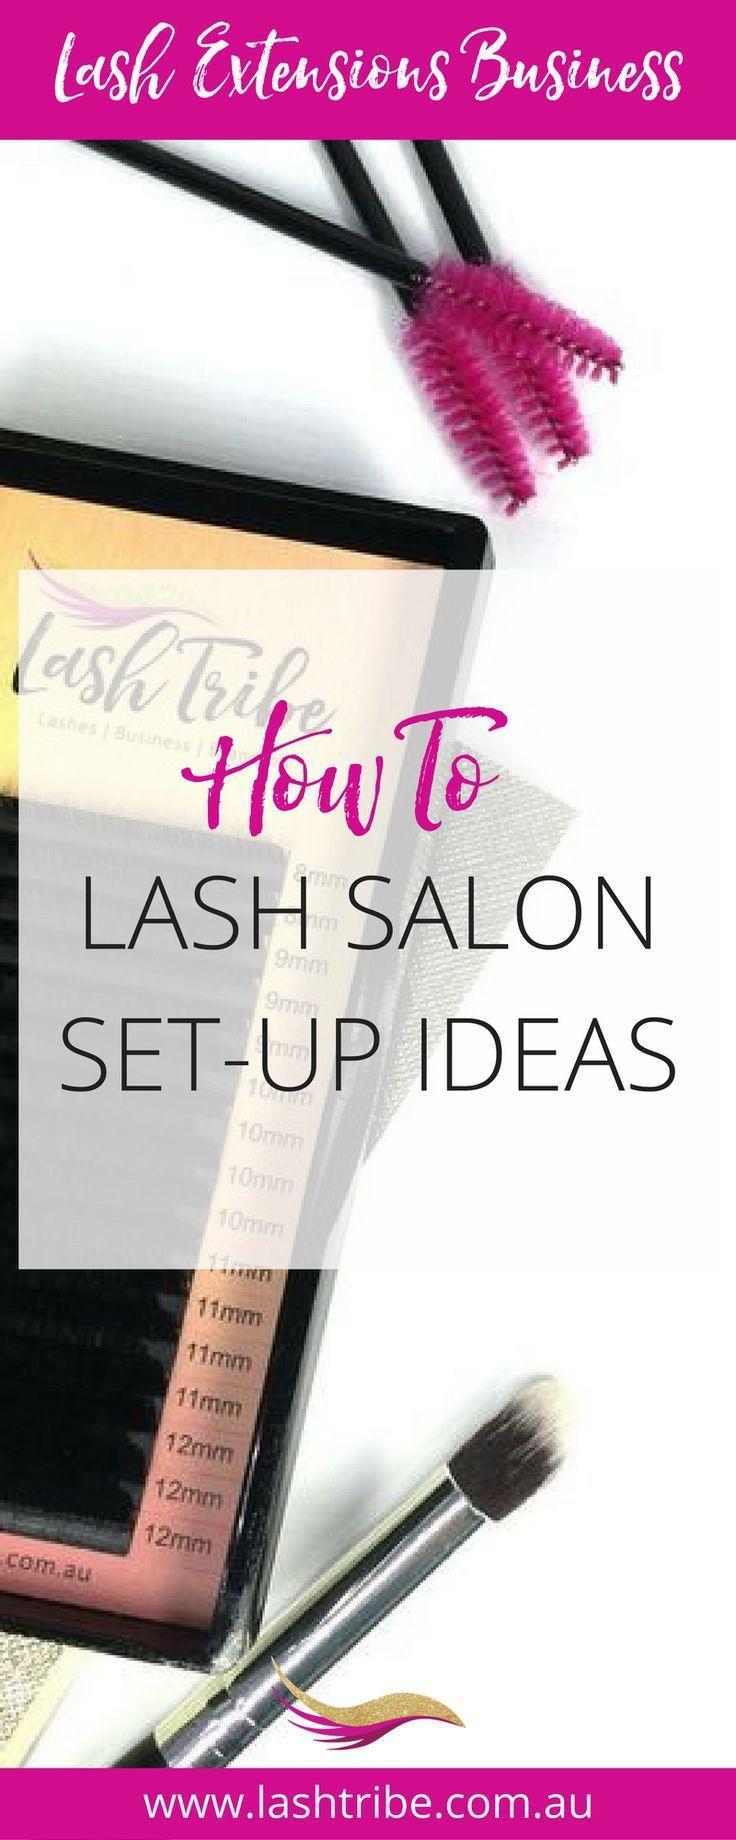 Eyelash Extensions Salon Set-Up Ideas | Pinterest | Lash room ...